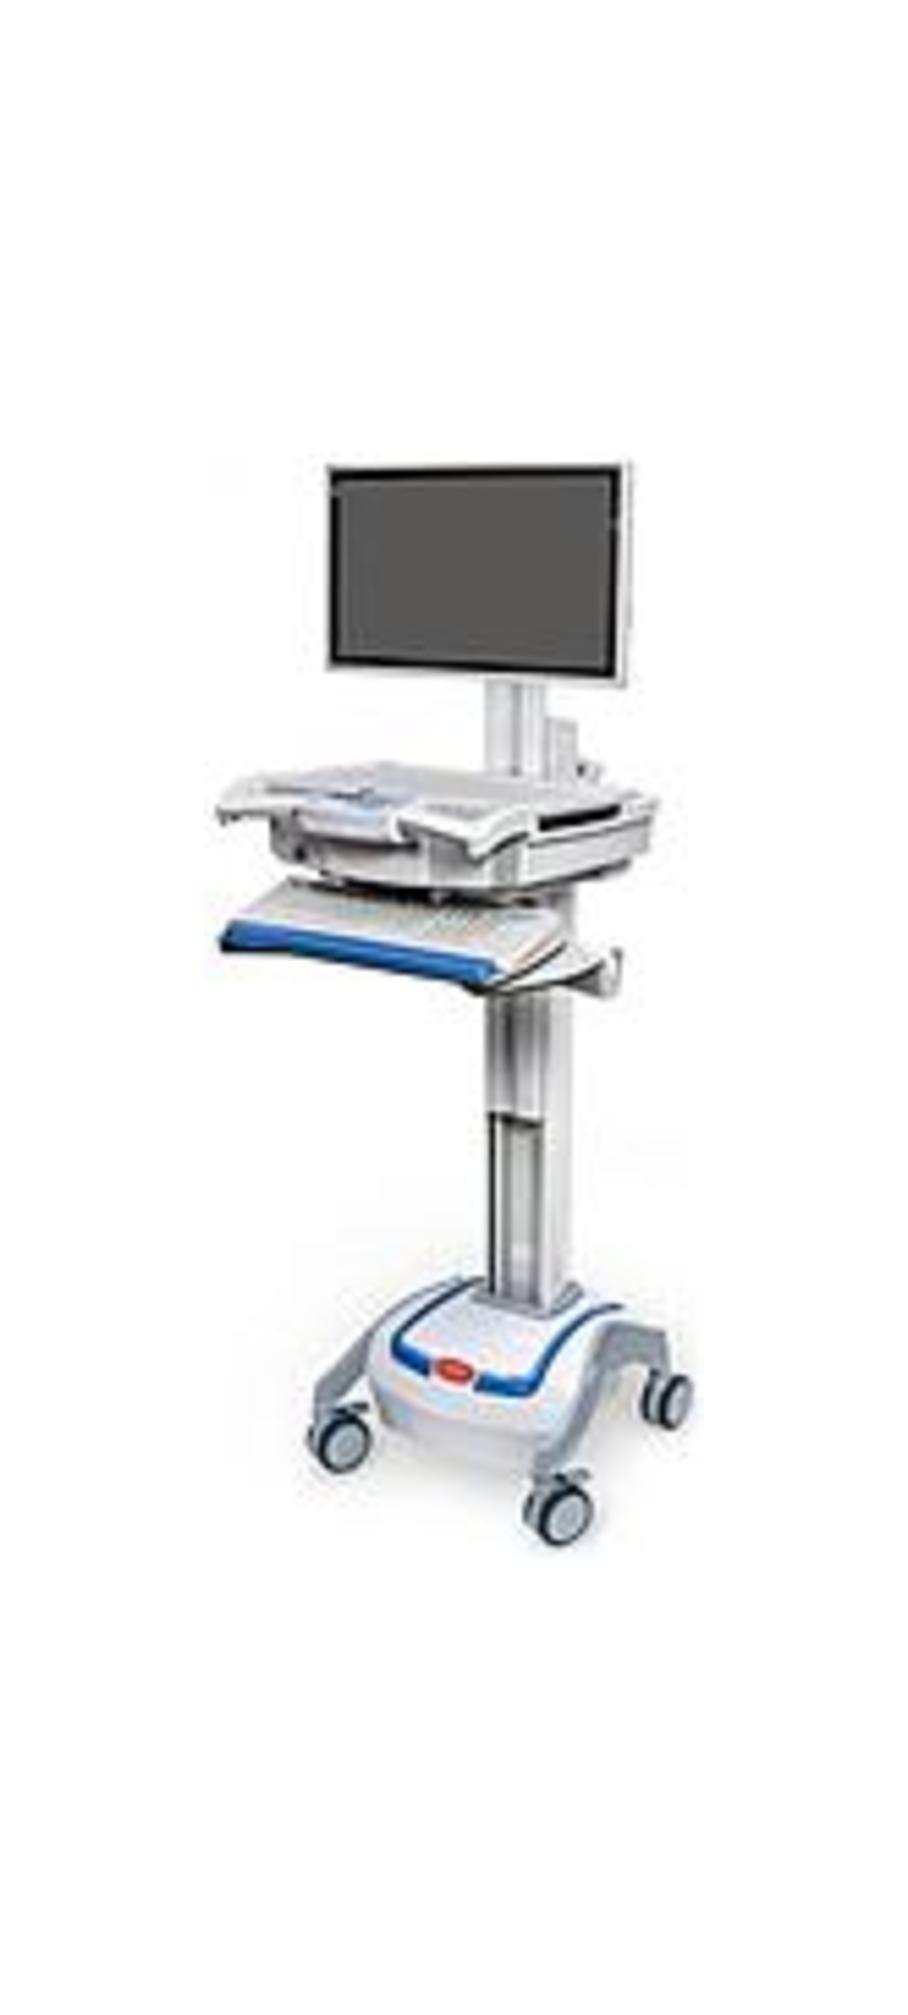 Capsa Healthcare 1975076 M38e XP Non-Powered Point of Care Mobile Cart - White